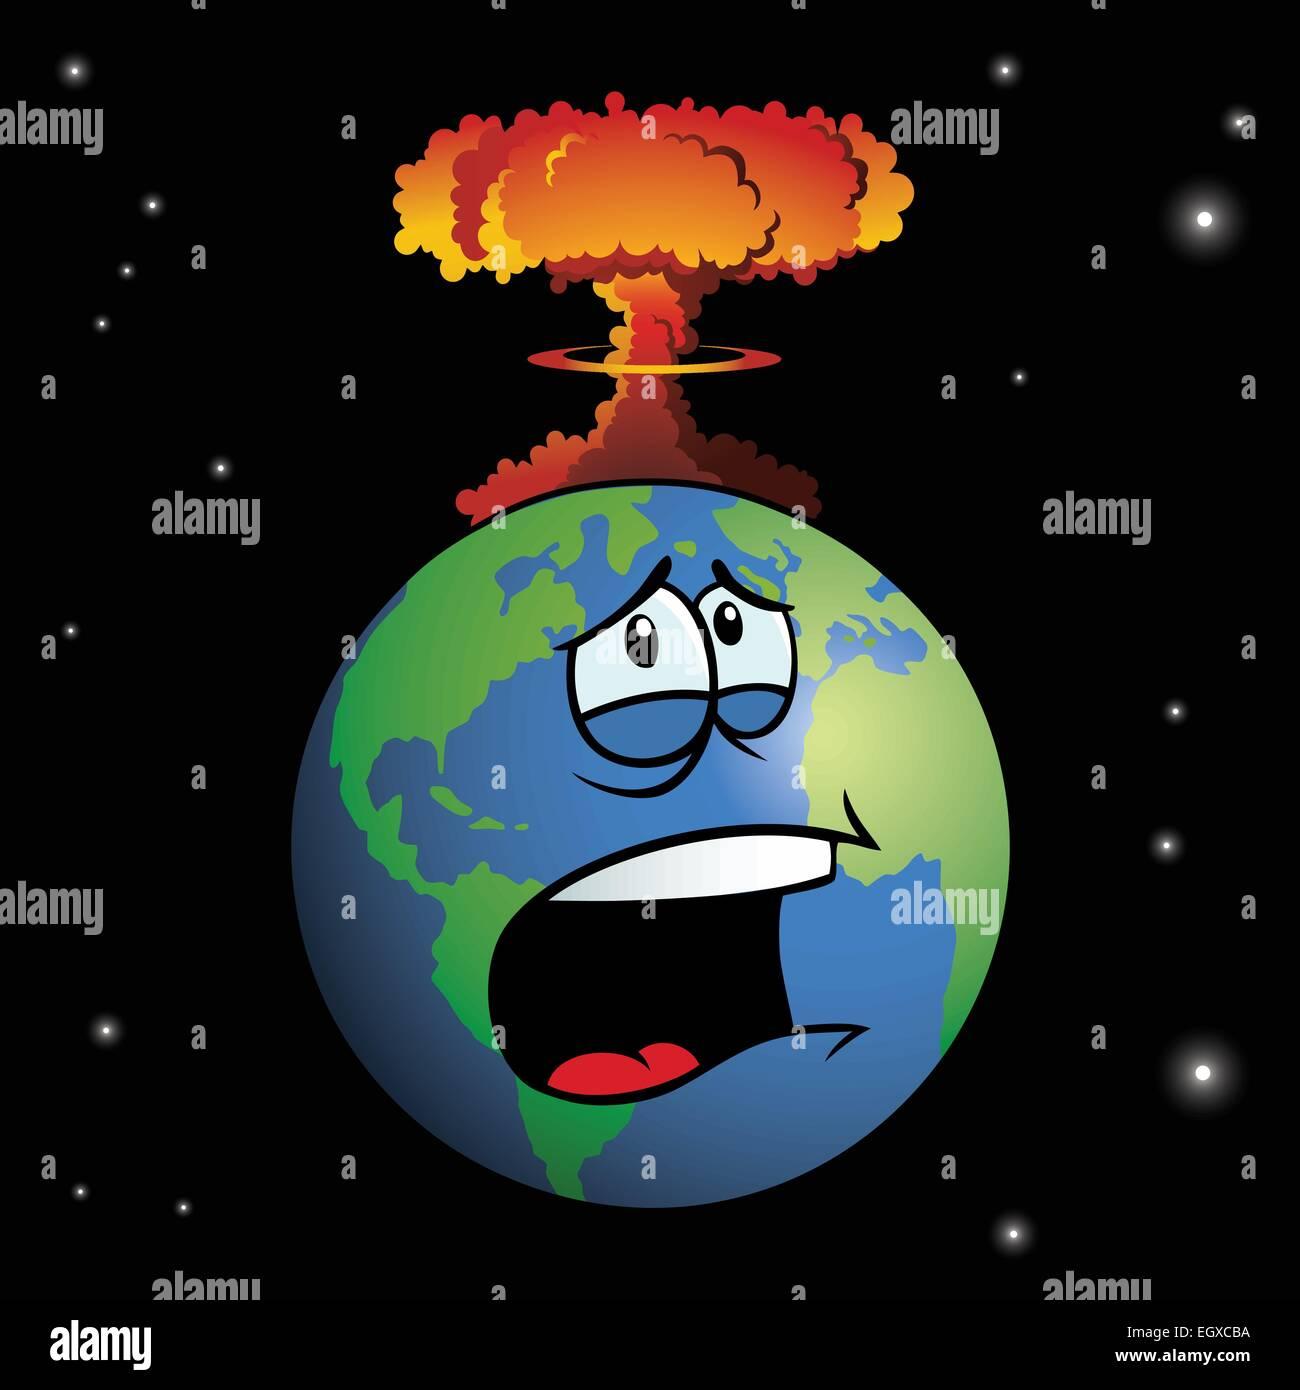 A nuclear weapon exploding on cartoon Earth, forming a mushroom cloud. - Stock Vector